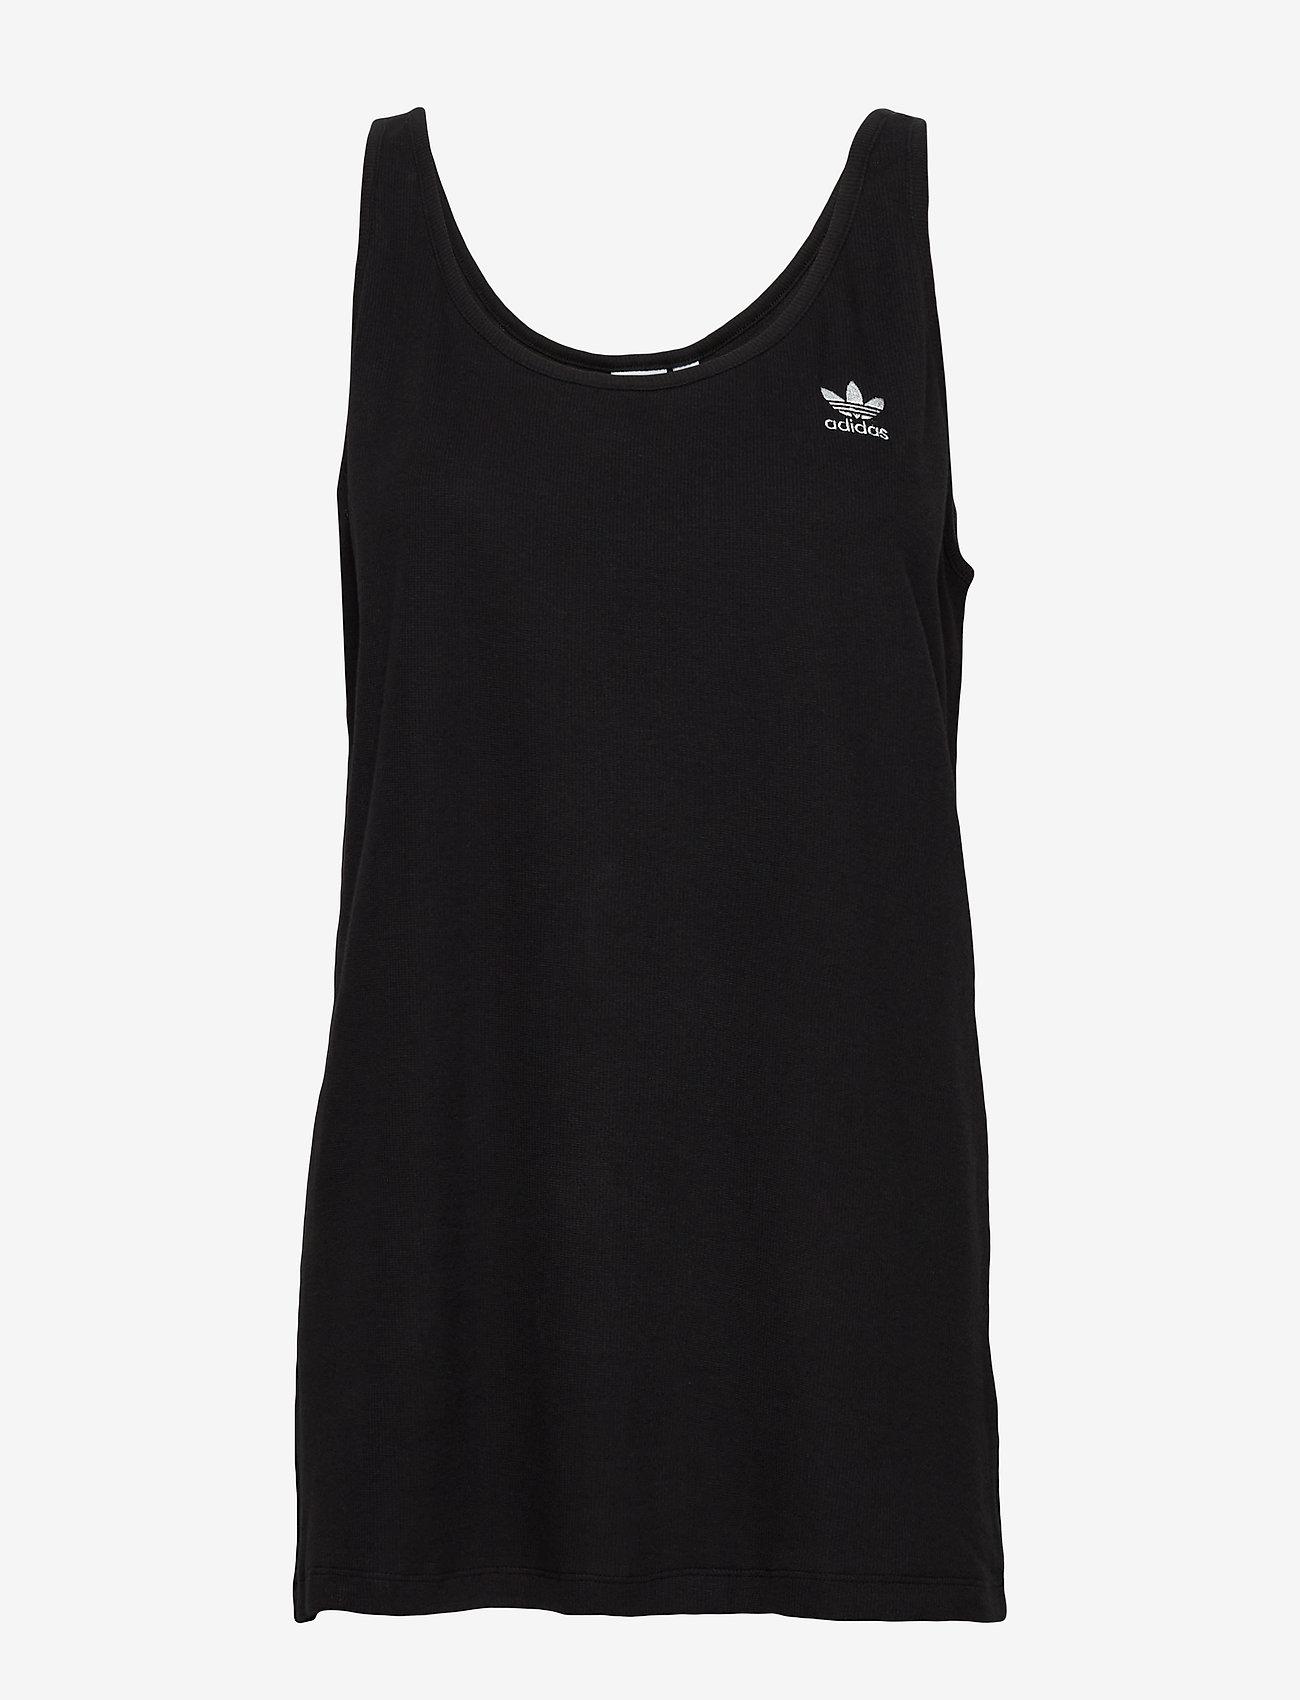 adidas Originals - TANK TOP - sporttoppar - black/white - 1